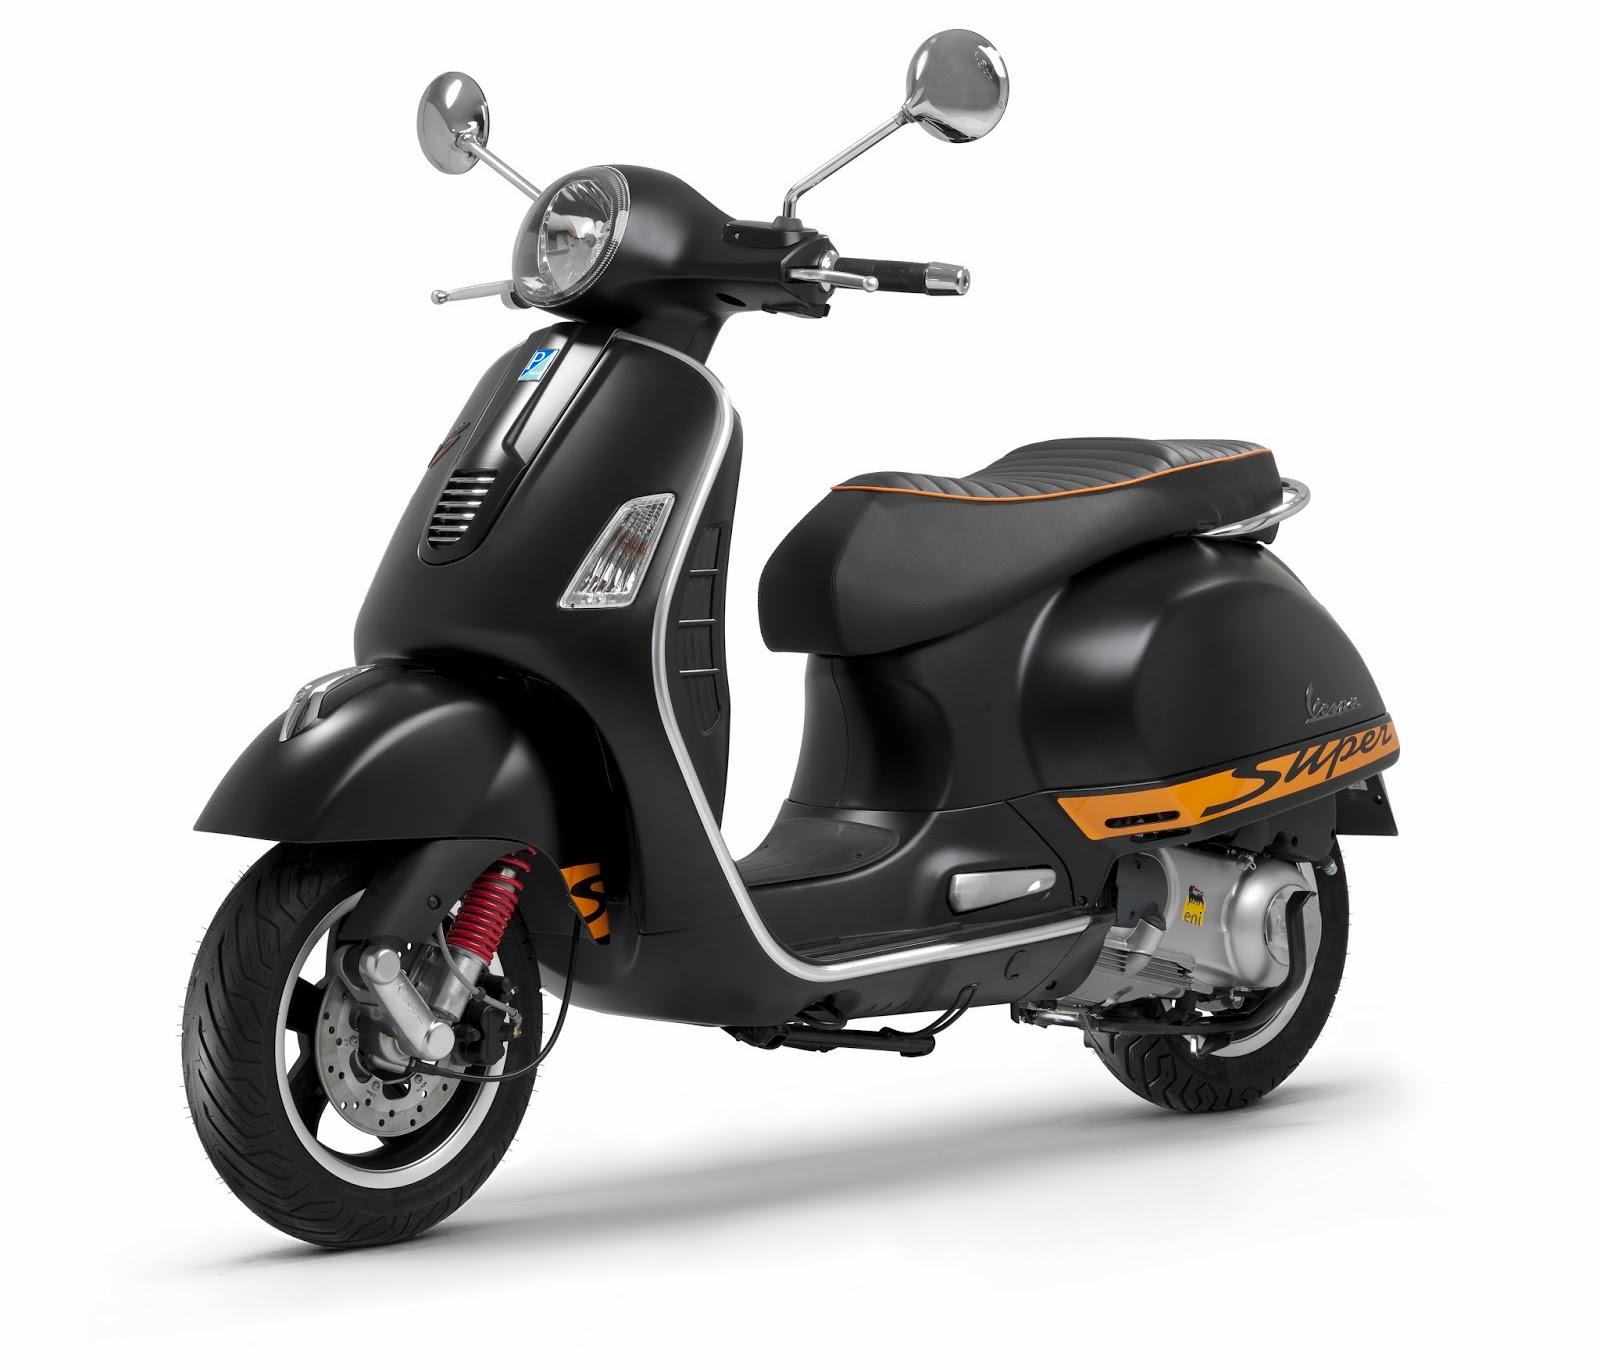 loja das motos vespa gts super sport 125 e 300. Black Bedroom Furniture Sets. Home Design Ideas